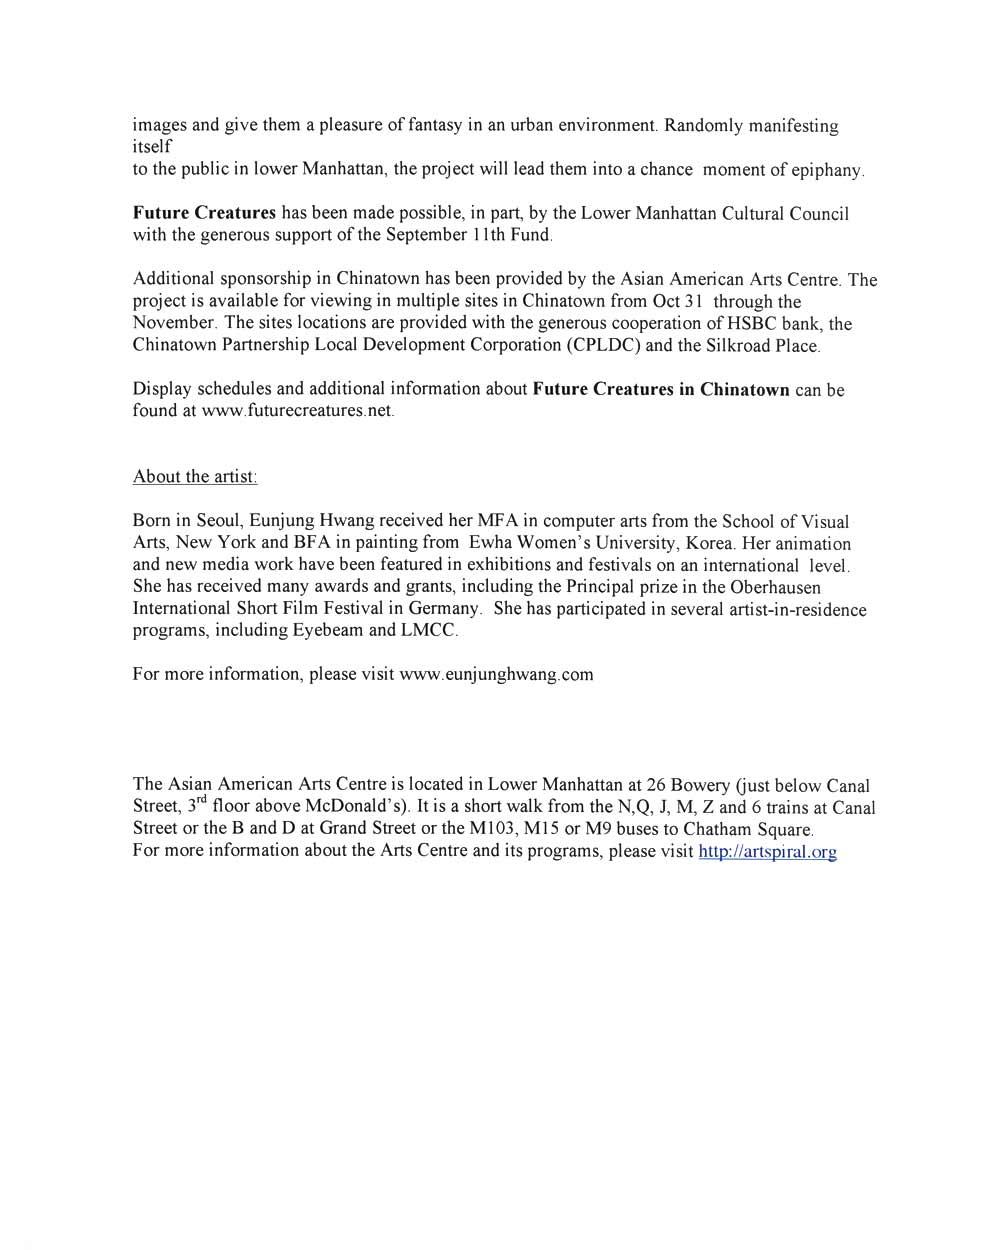 Future Creatures, press release, pg 2